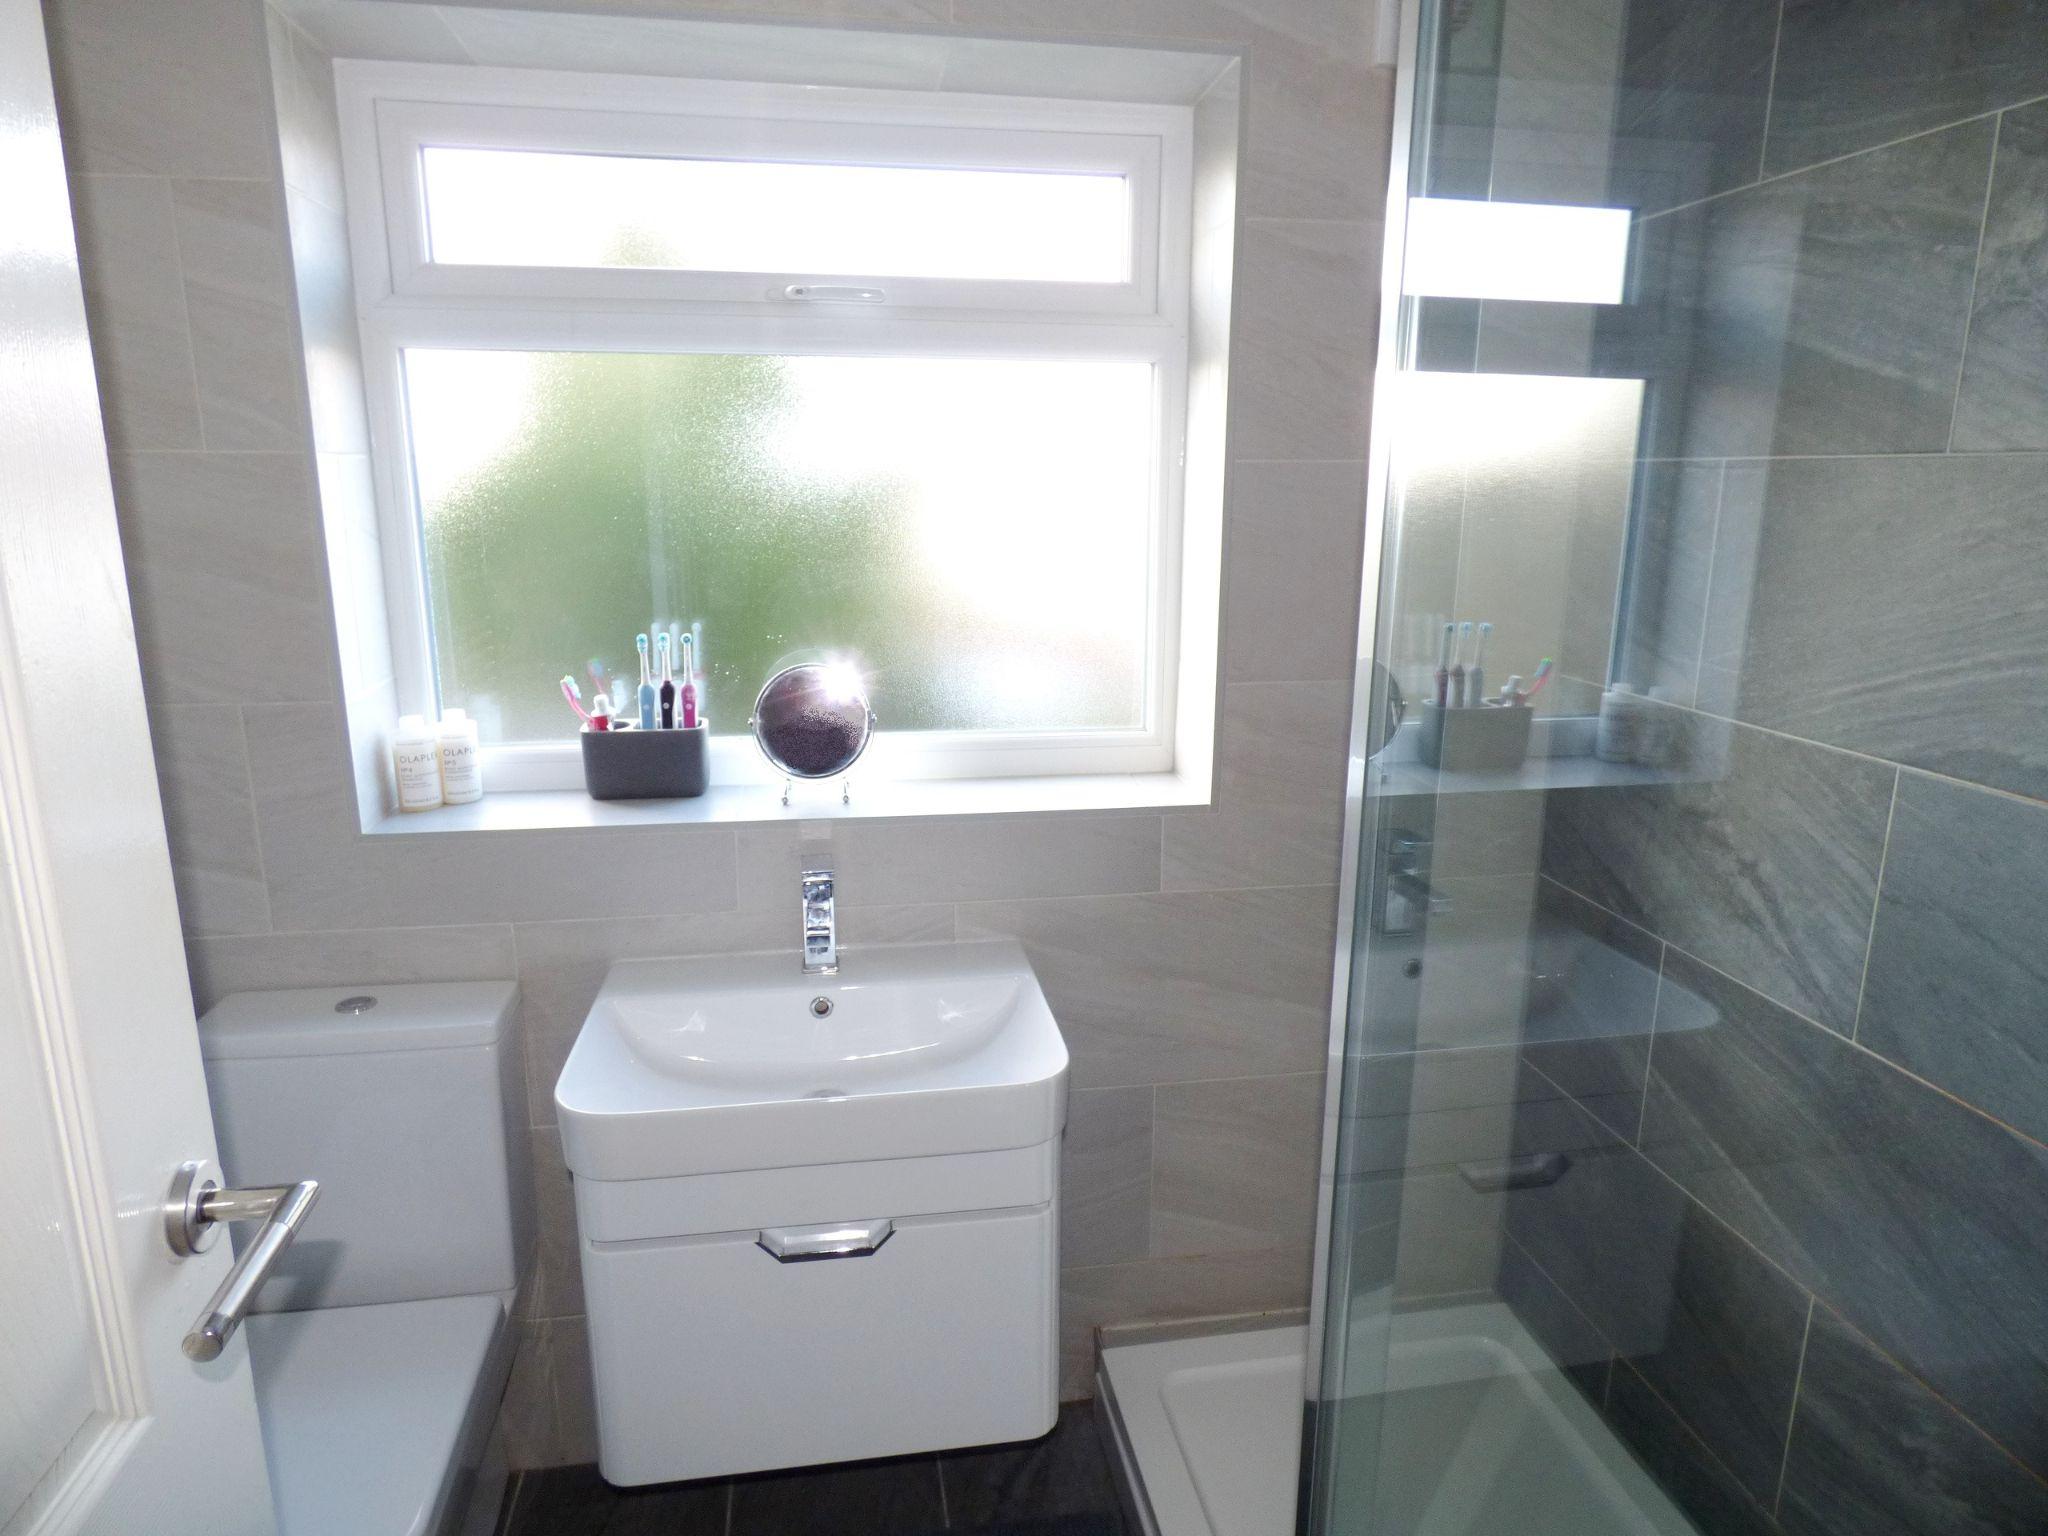 3 Bedroom Semi-detached House For Sale - Bathroom